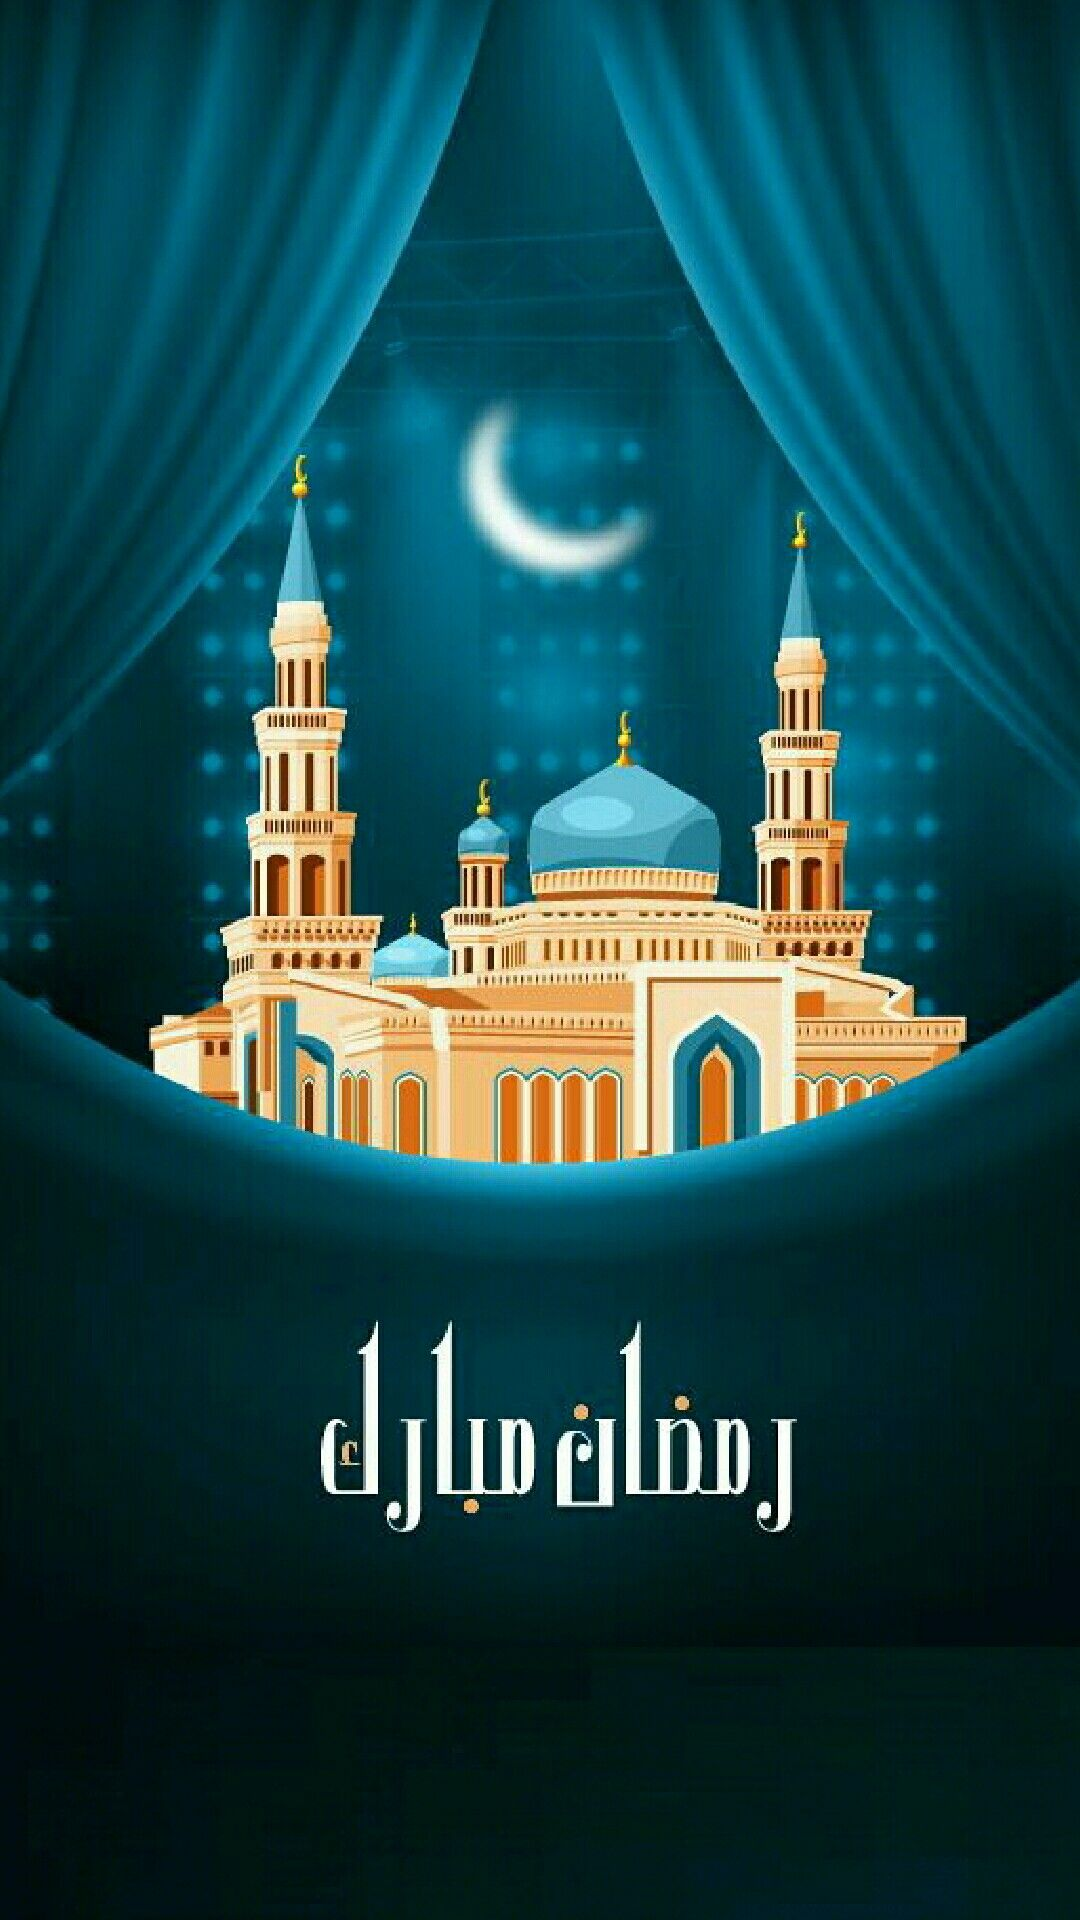 Pin By Iqraa Jsc On اطارات Ramadan Mubarak Wallpapers Ramadan Poster Eid Wallpaper